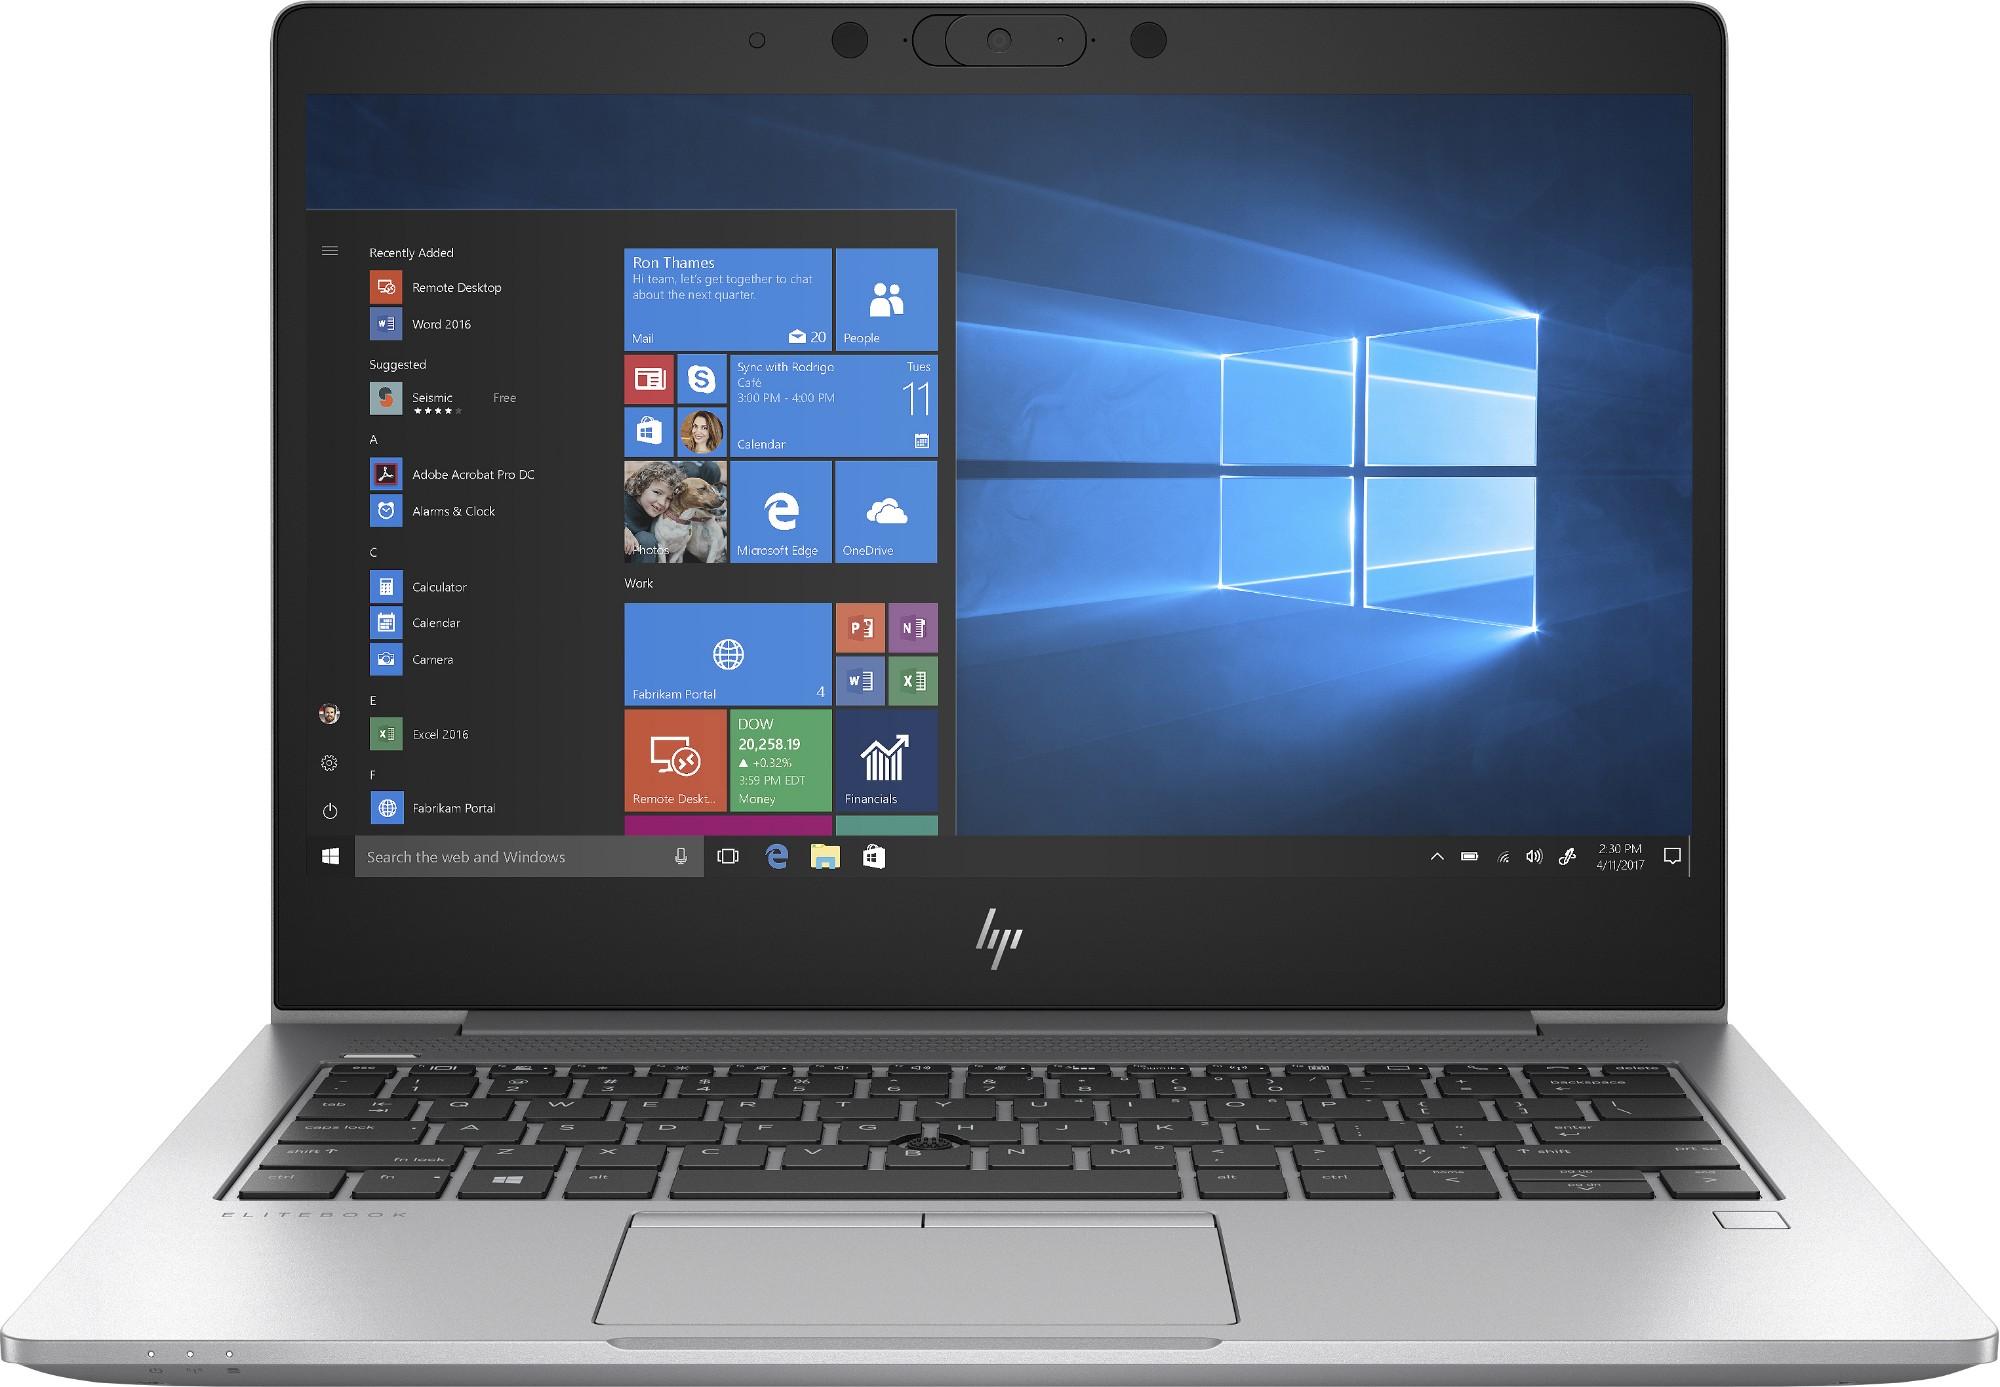 "HP EliteBook PC portabil 735 G6 Portátil Plata 33,8 cm (13.3"") 1920 x 1080 Pixeles AMD Ryzen 5 PRO 8 GB DDR4-SDRAM 256 GB SSD Wi-Fi 5 (802.11ac) Windows 10 Pro"